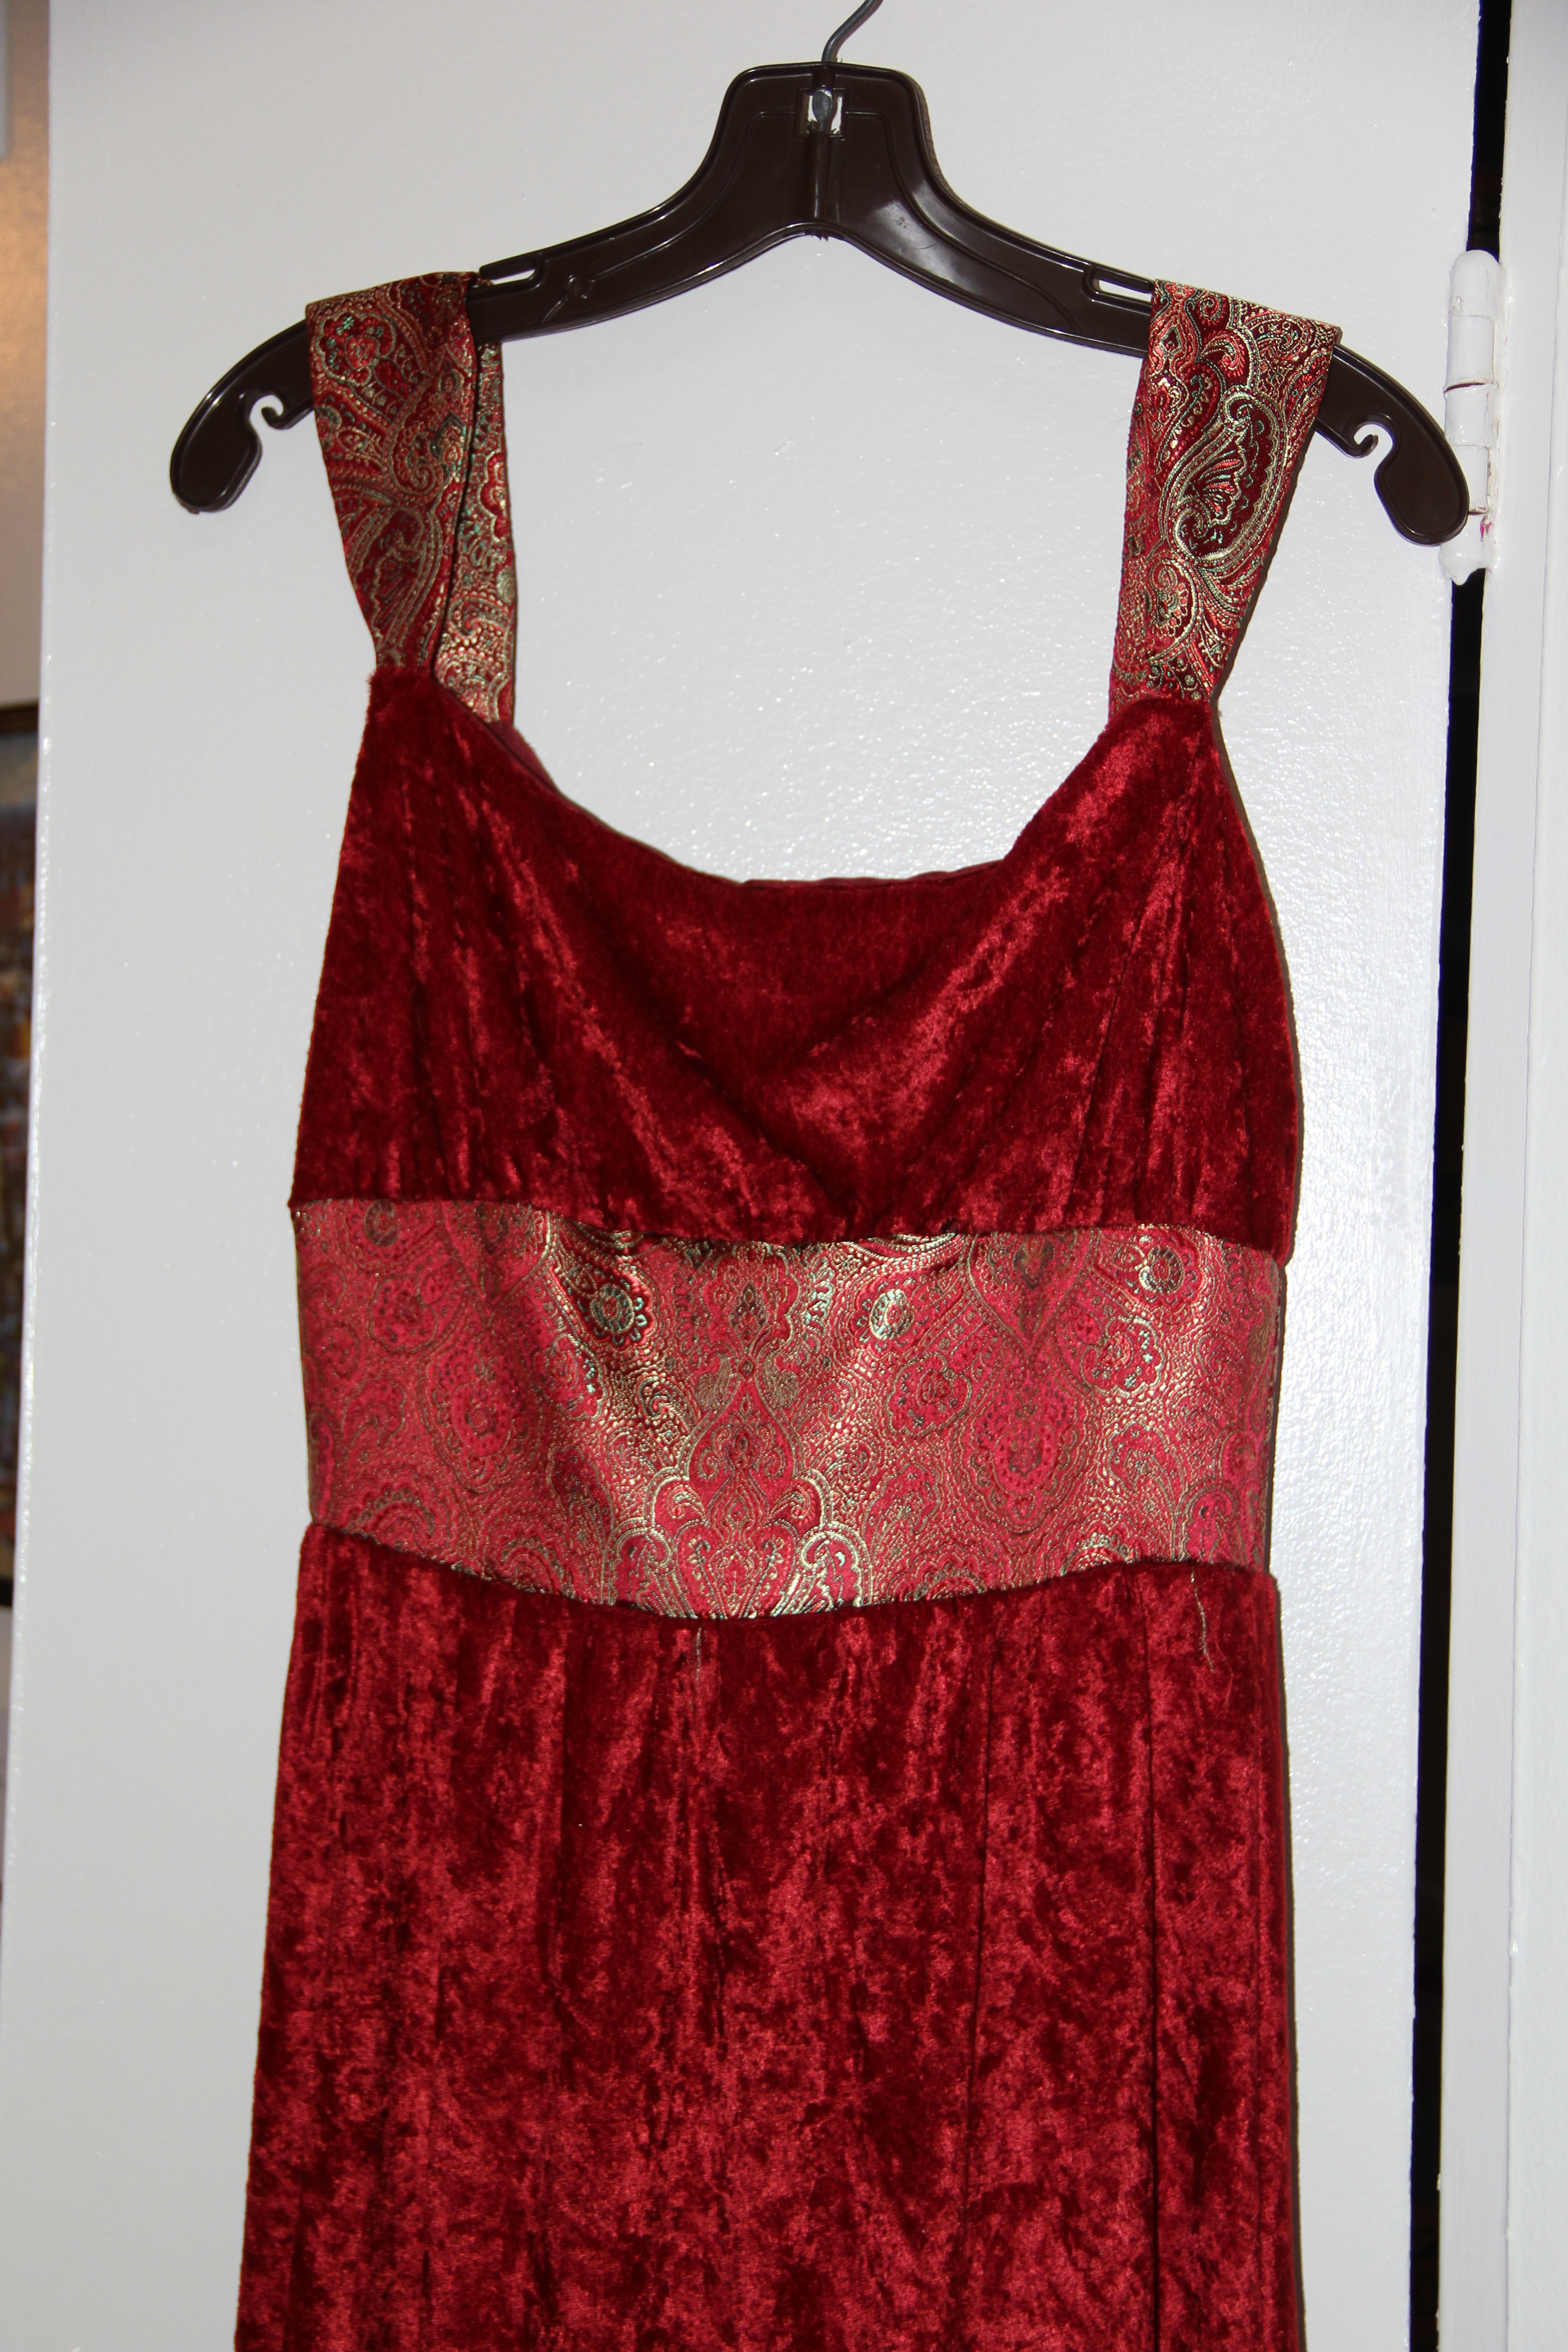 Midriff Dress